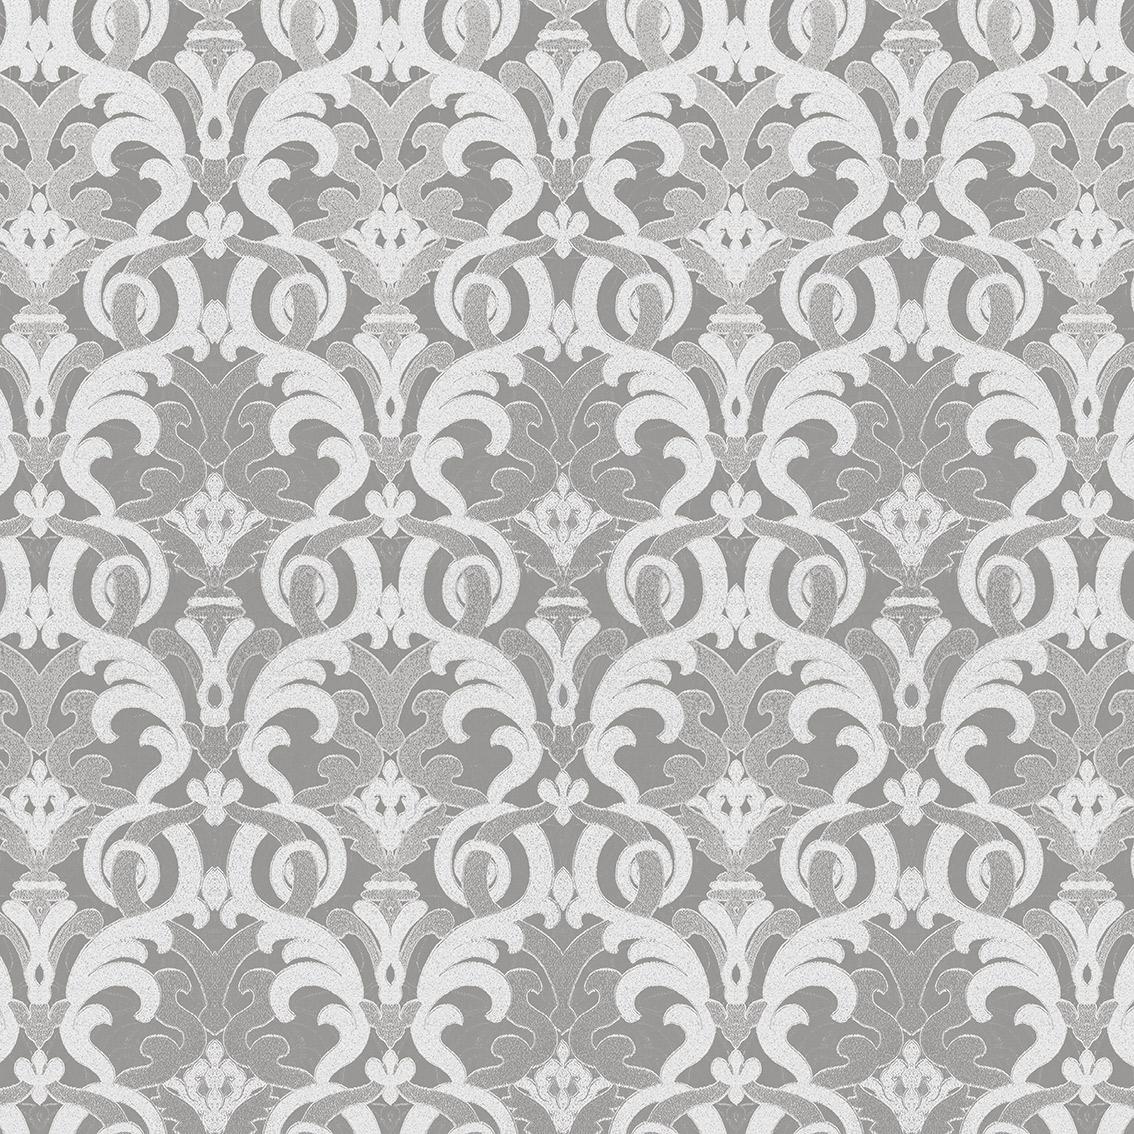 Коллекция ткани Ikarussa 6354,  купить ткань Жаккард для мебели Украина